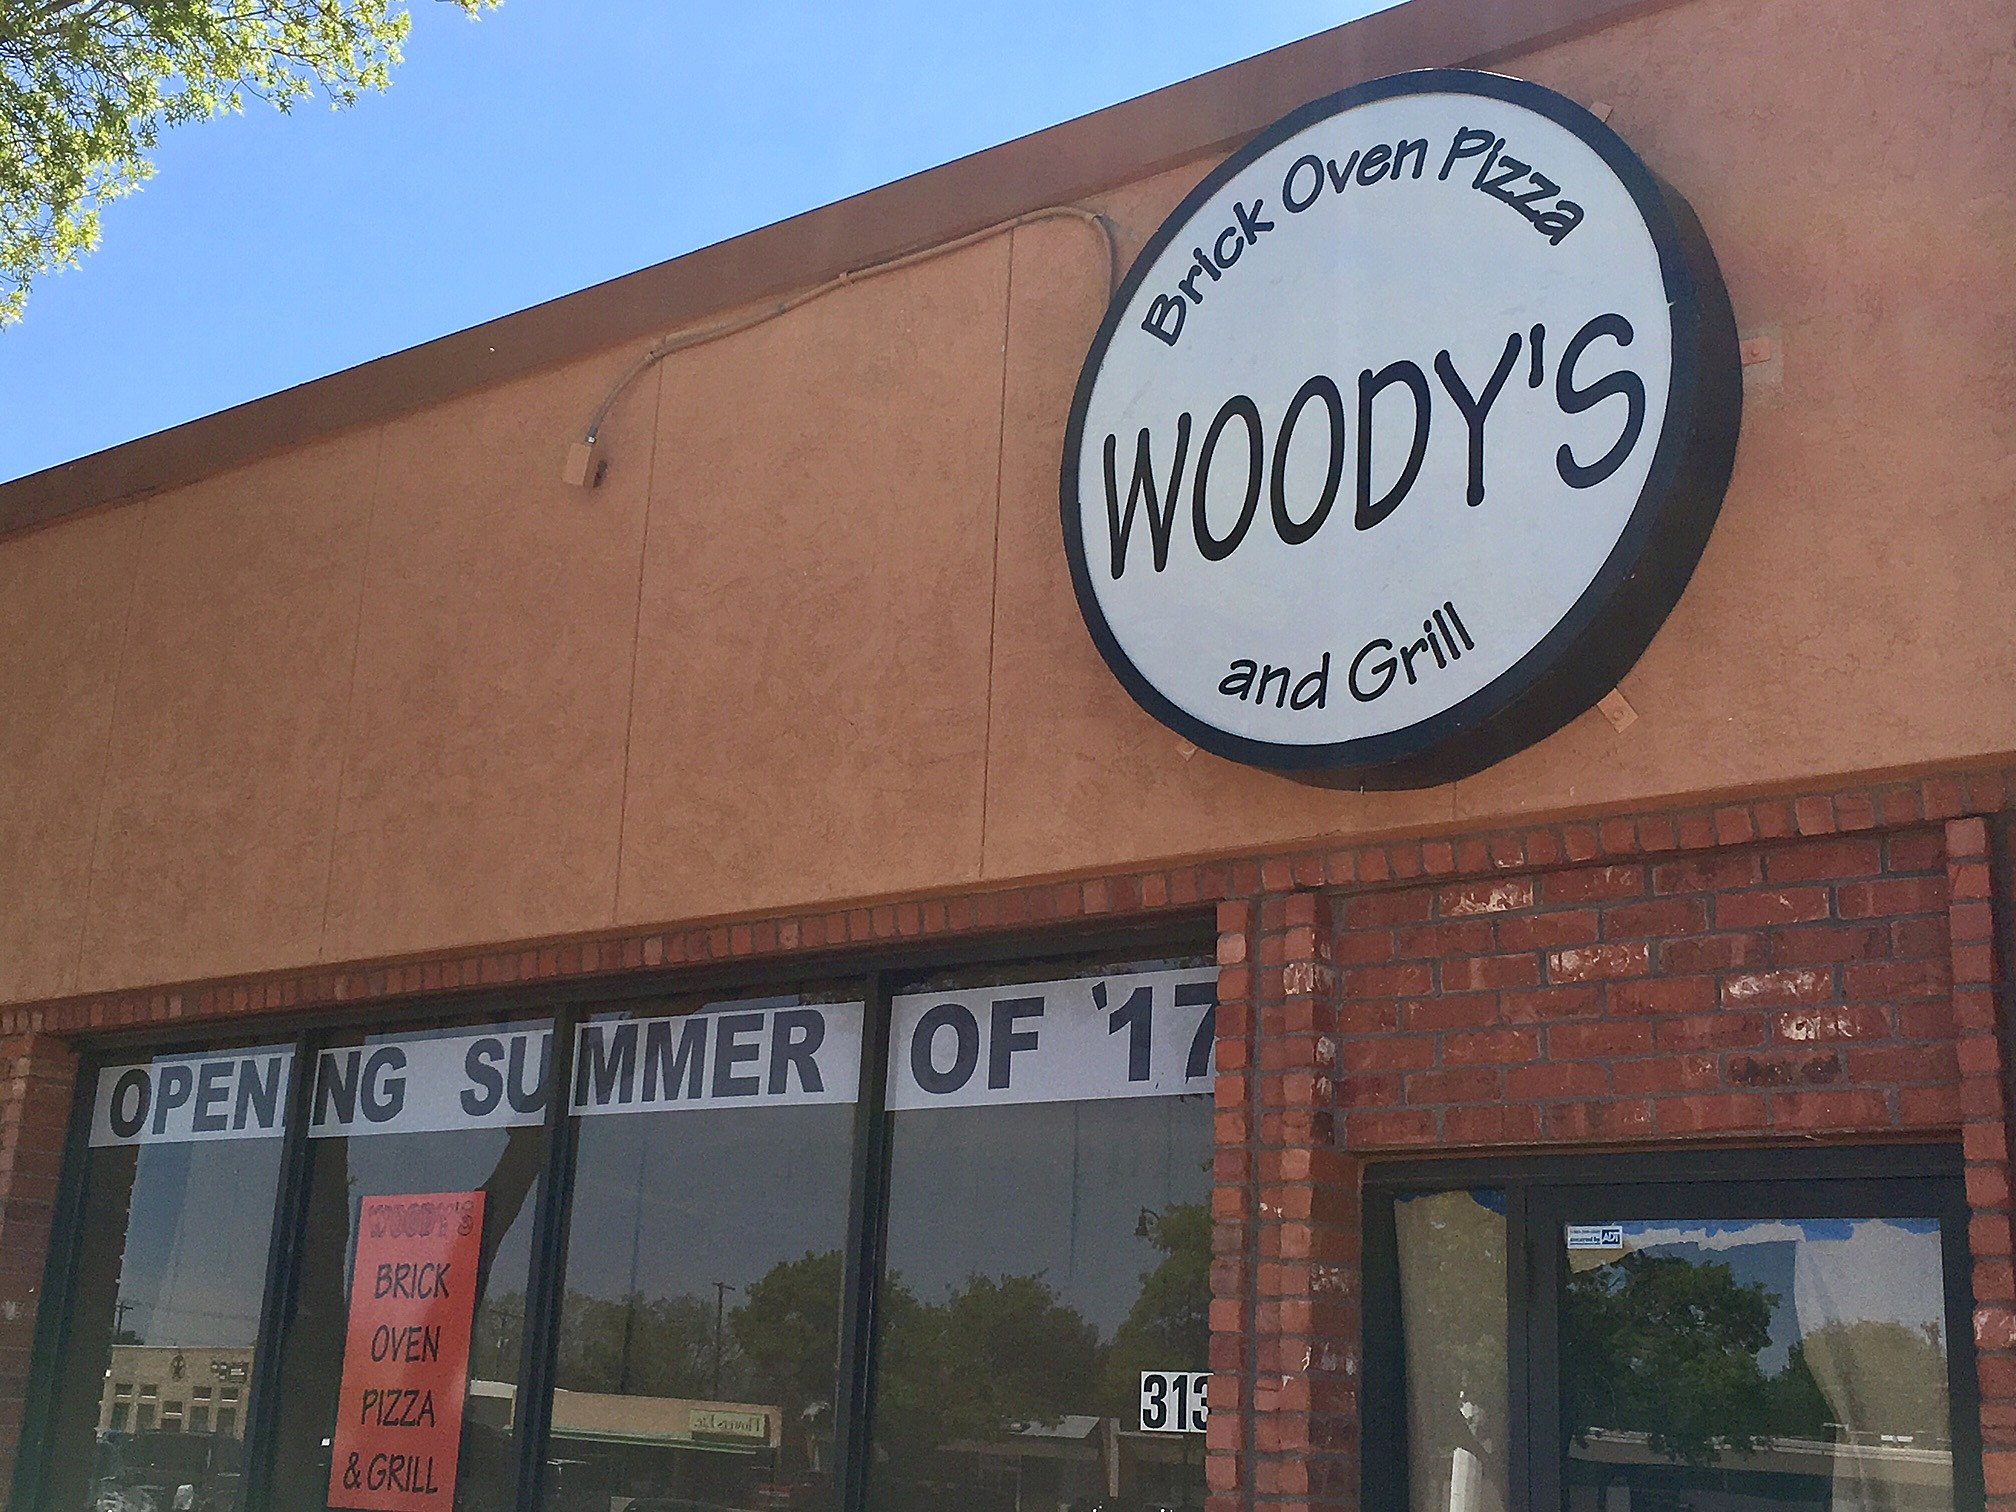 Woody's pizza in Lubbock, Texas